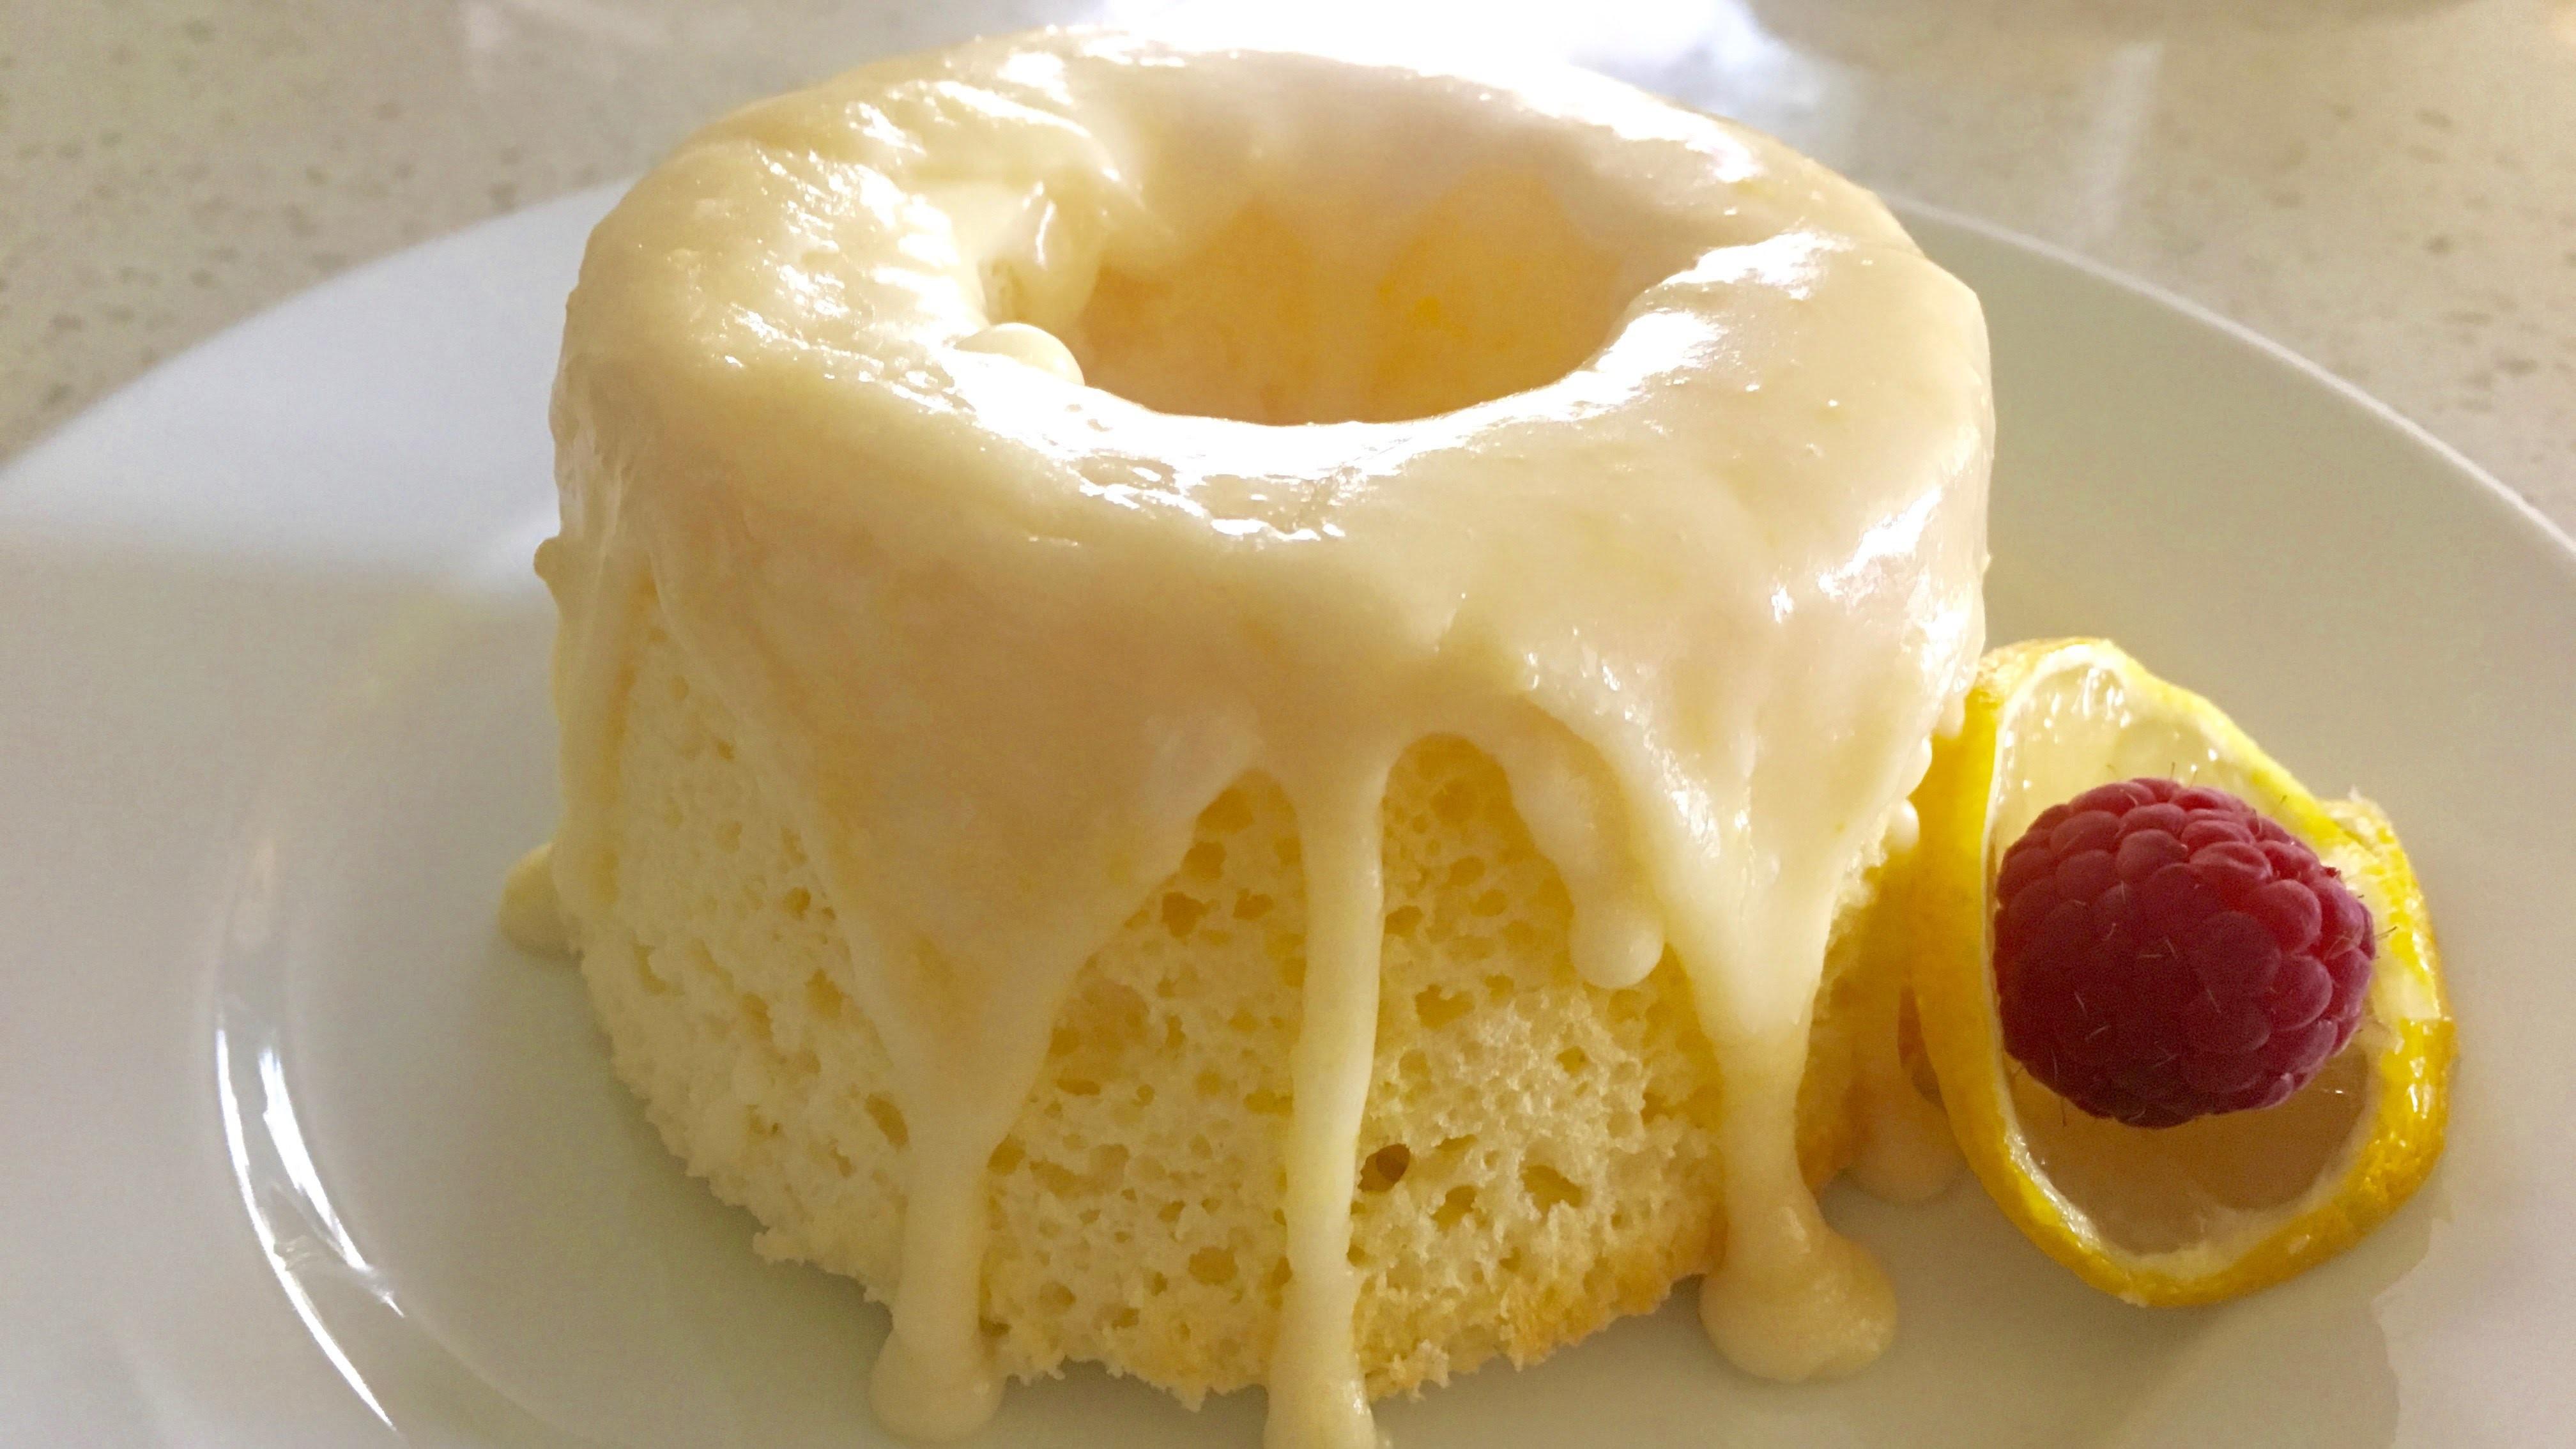 Lemon Chiffon Cake   How to make Chiffon Cake   TASTY TREATS